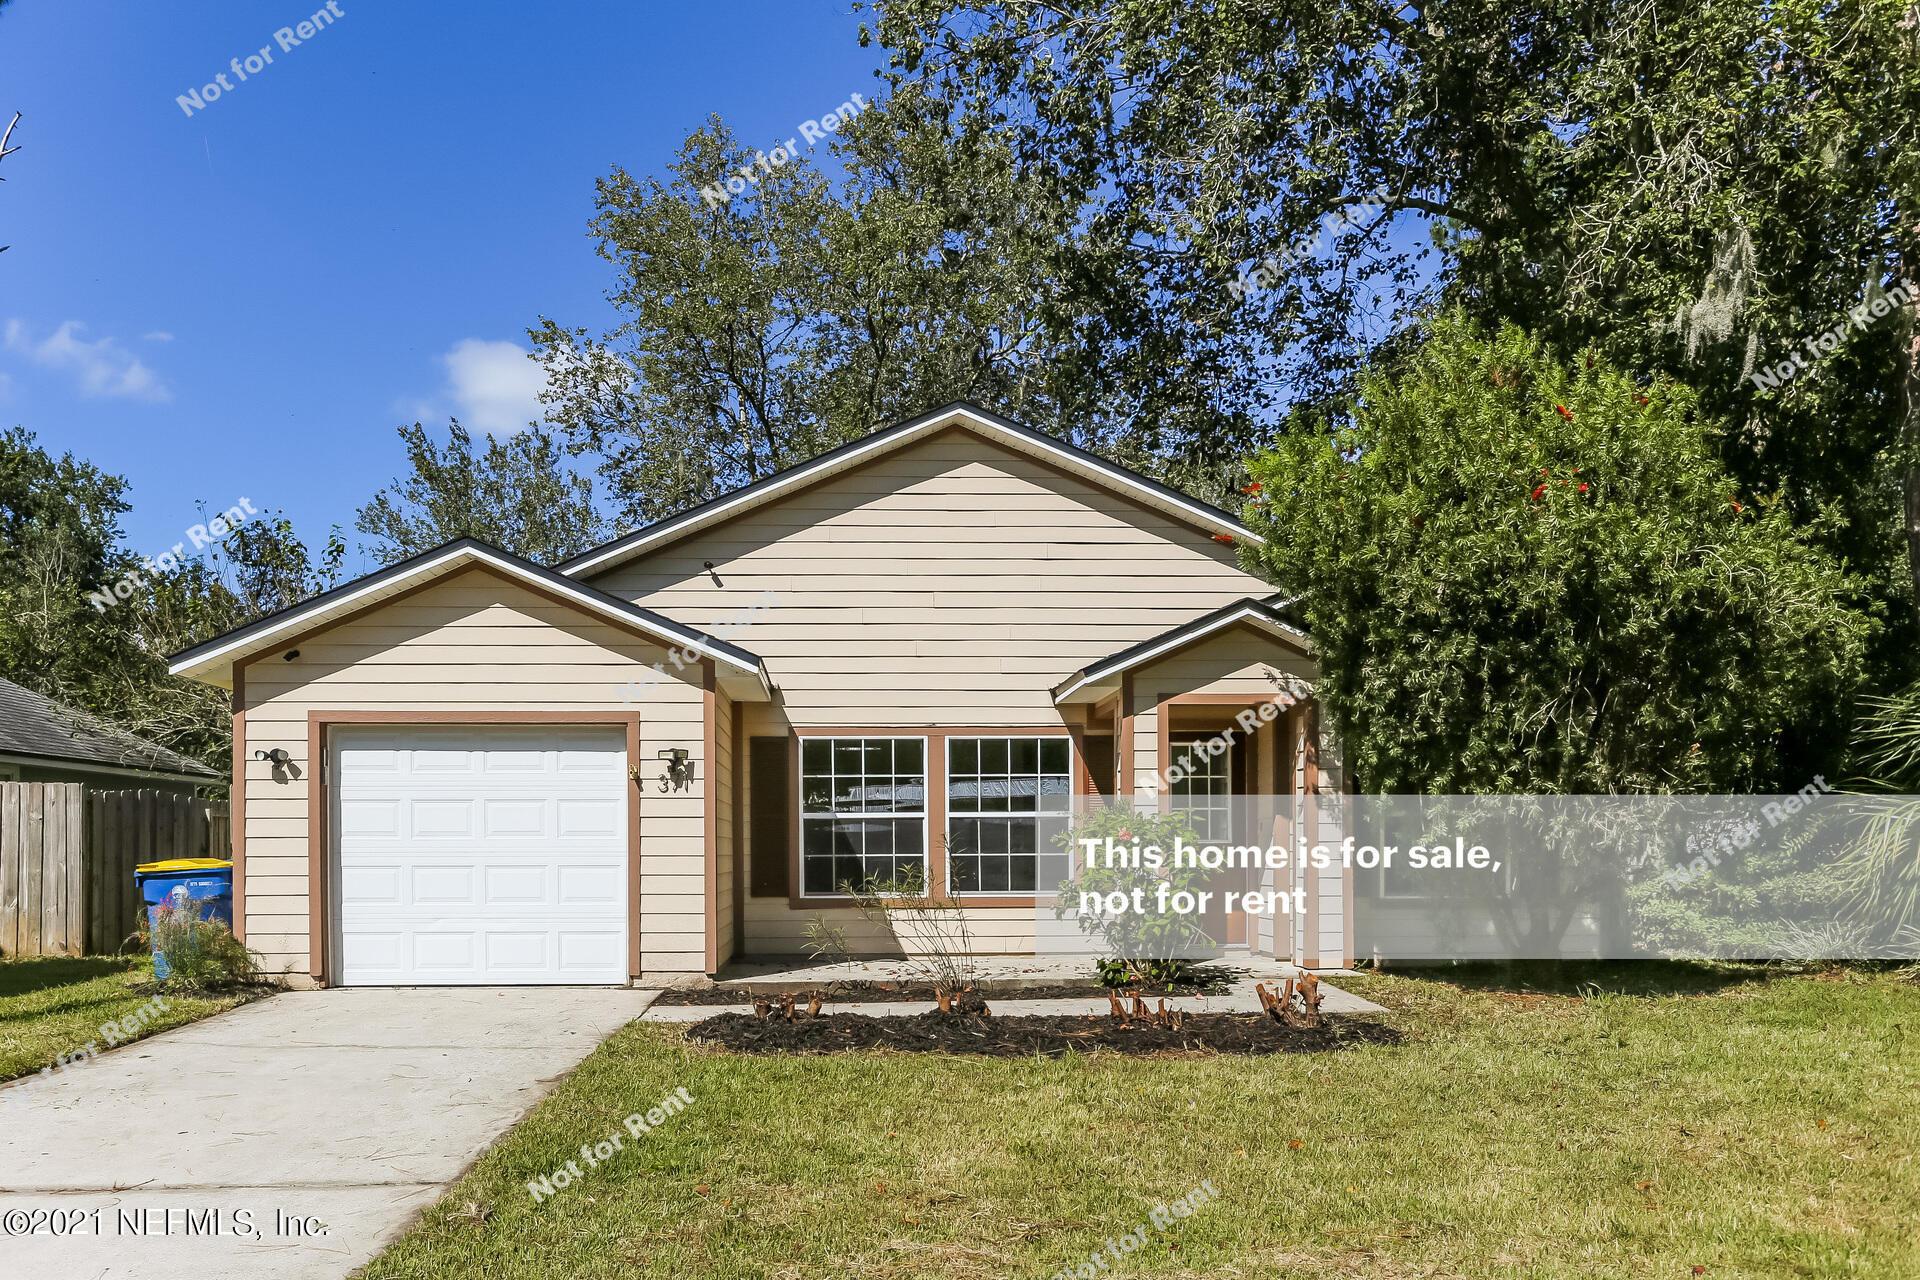 371 ERIC, JACKSONVILLE, FLORIDA 32218, 4 Bedrooms Bedrooms, ,2 BathroomsBathrooms,Residential,For sale,ERIC,1136771